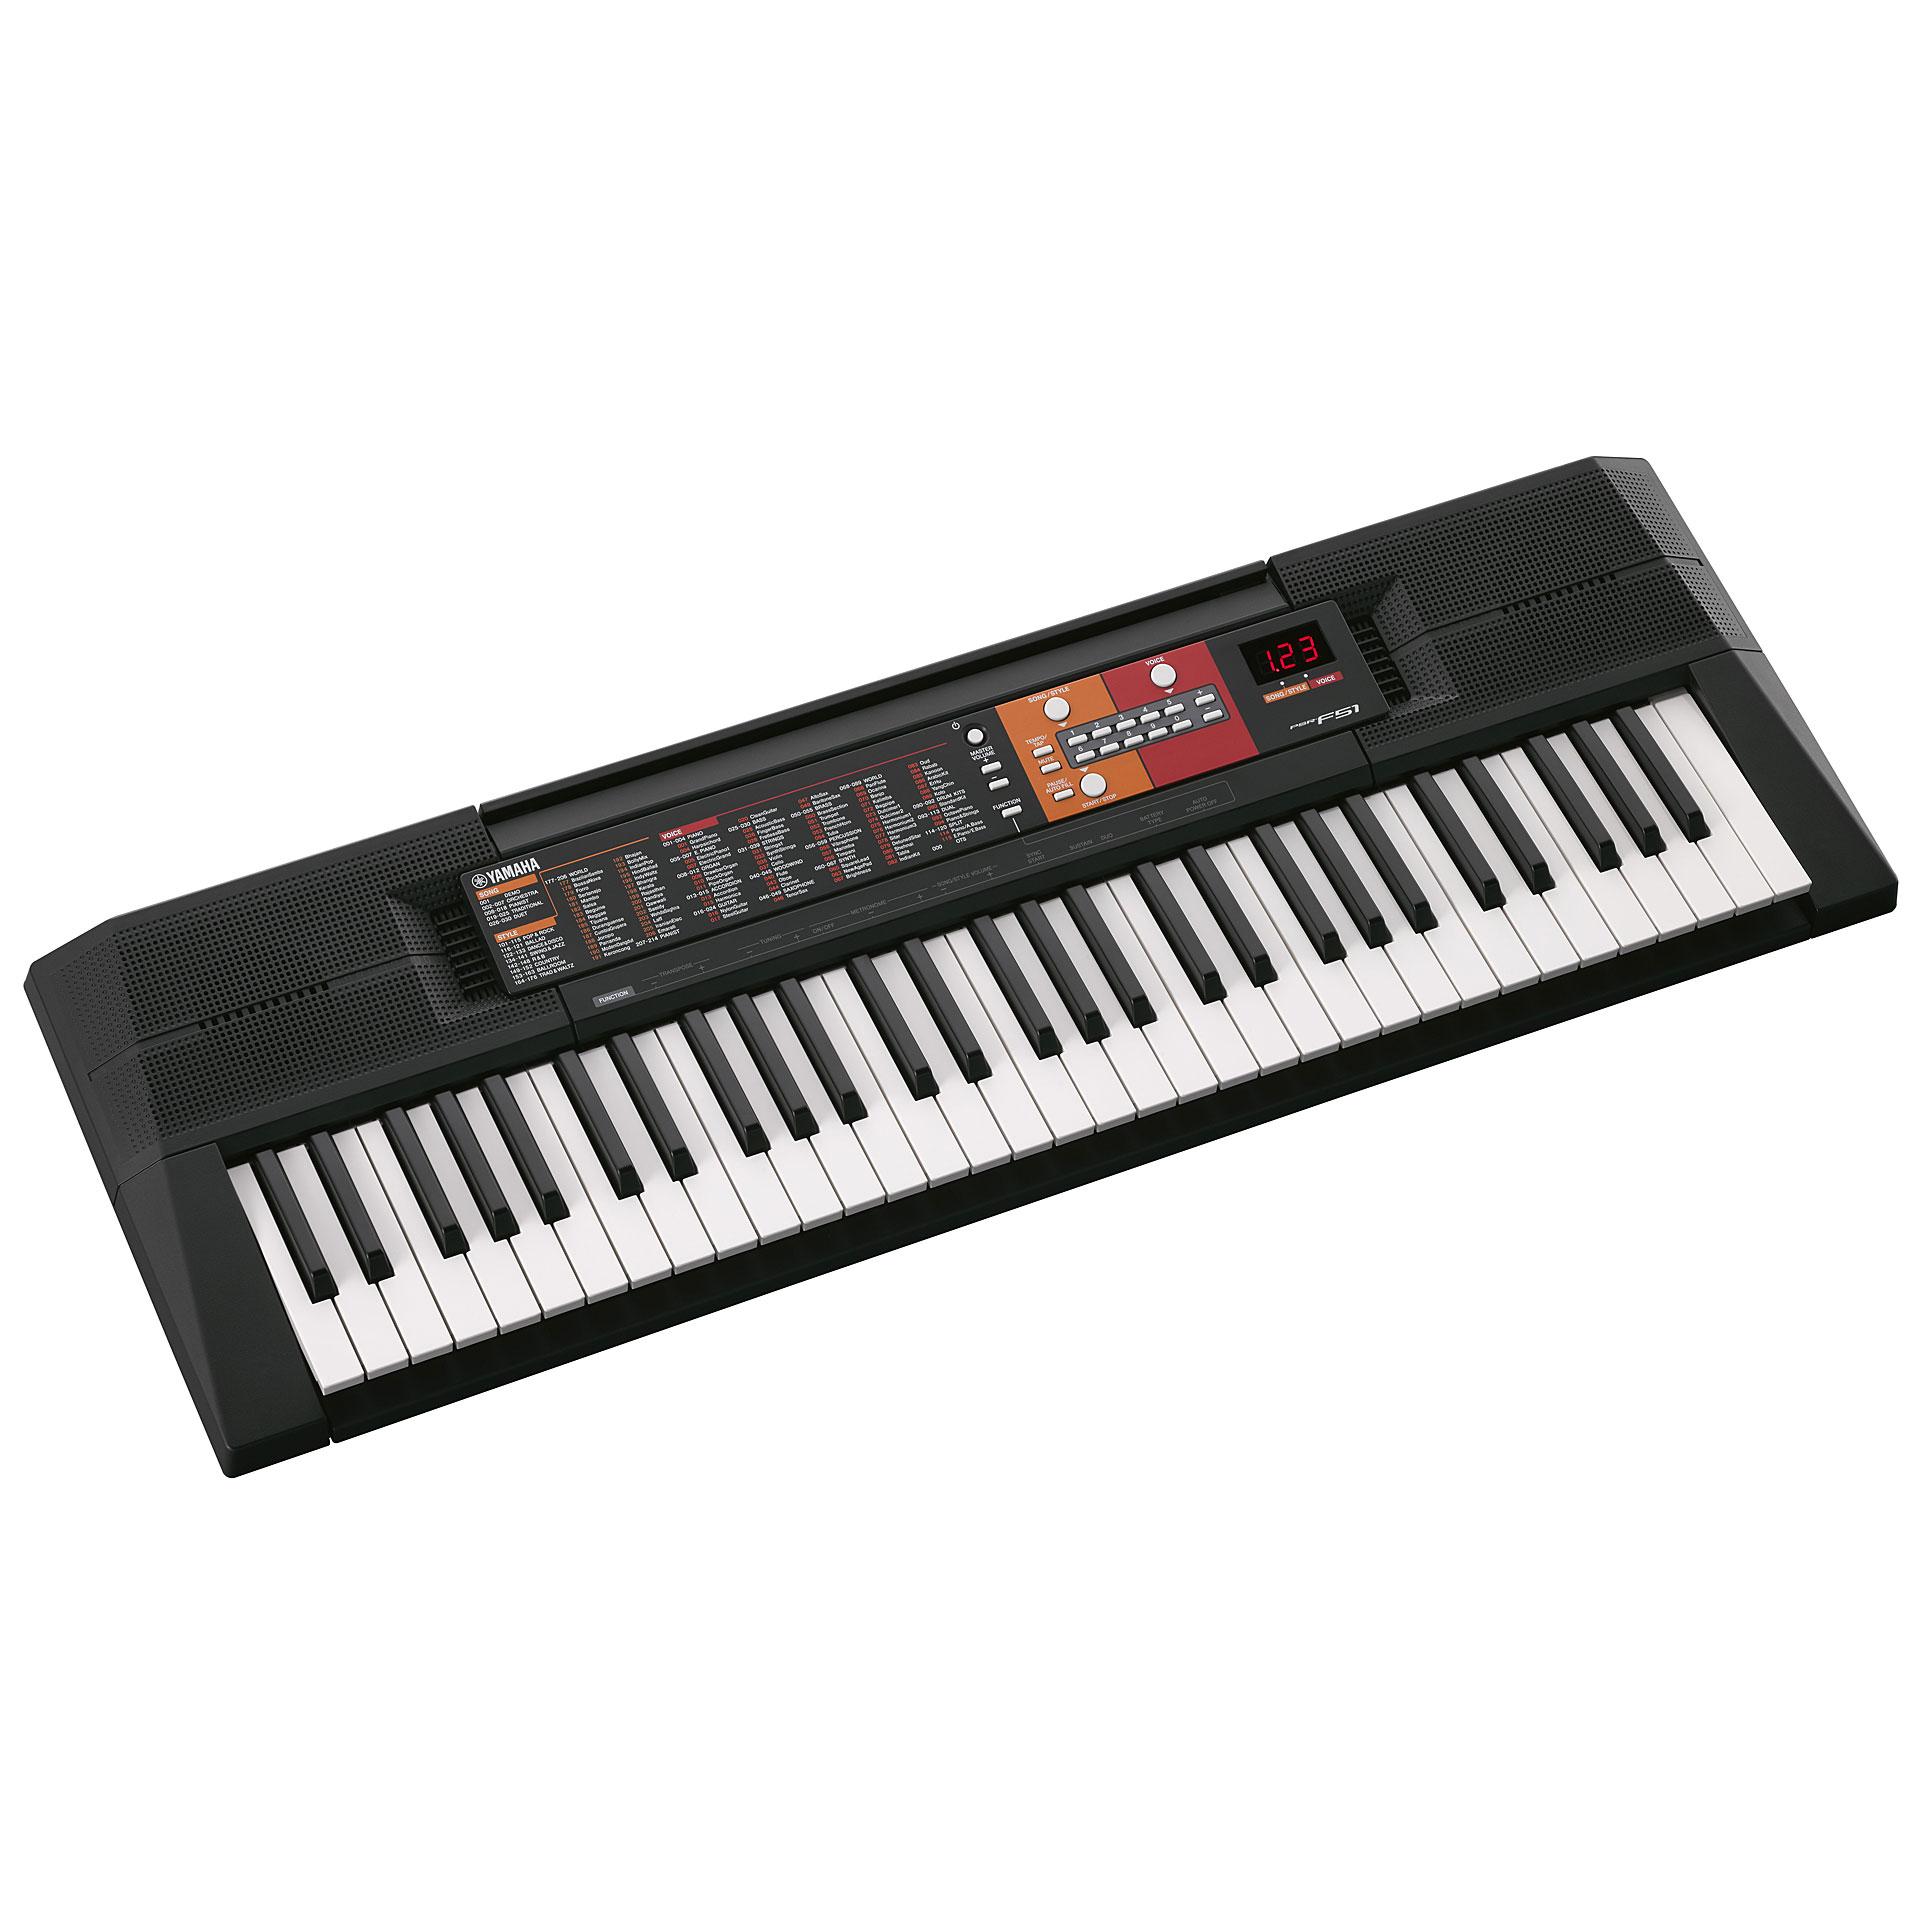 Yamaha Keyboard Instruction Manual